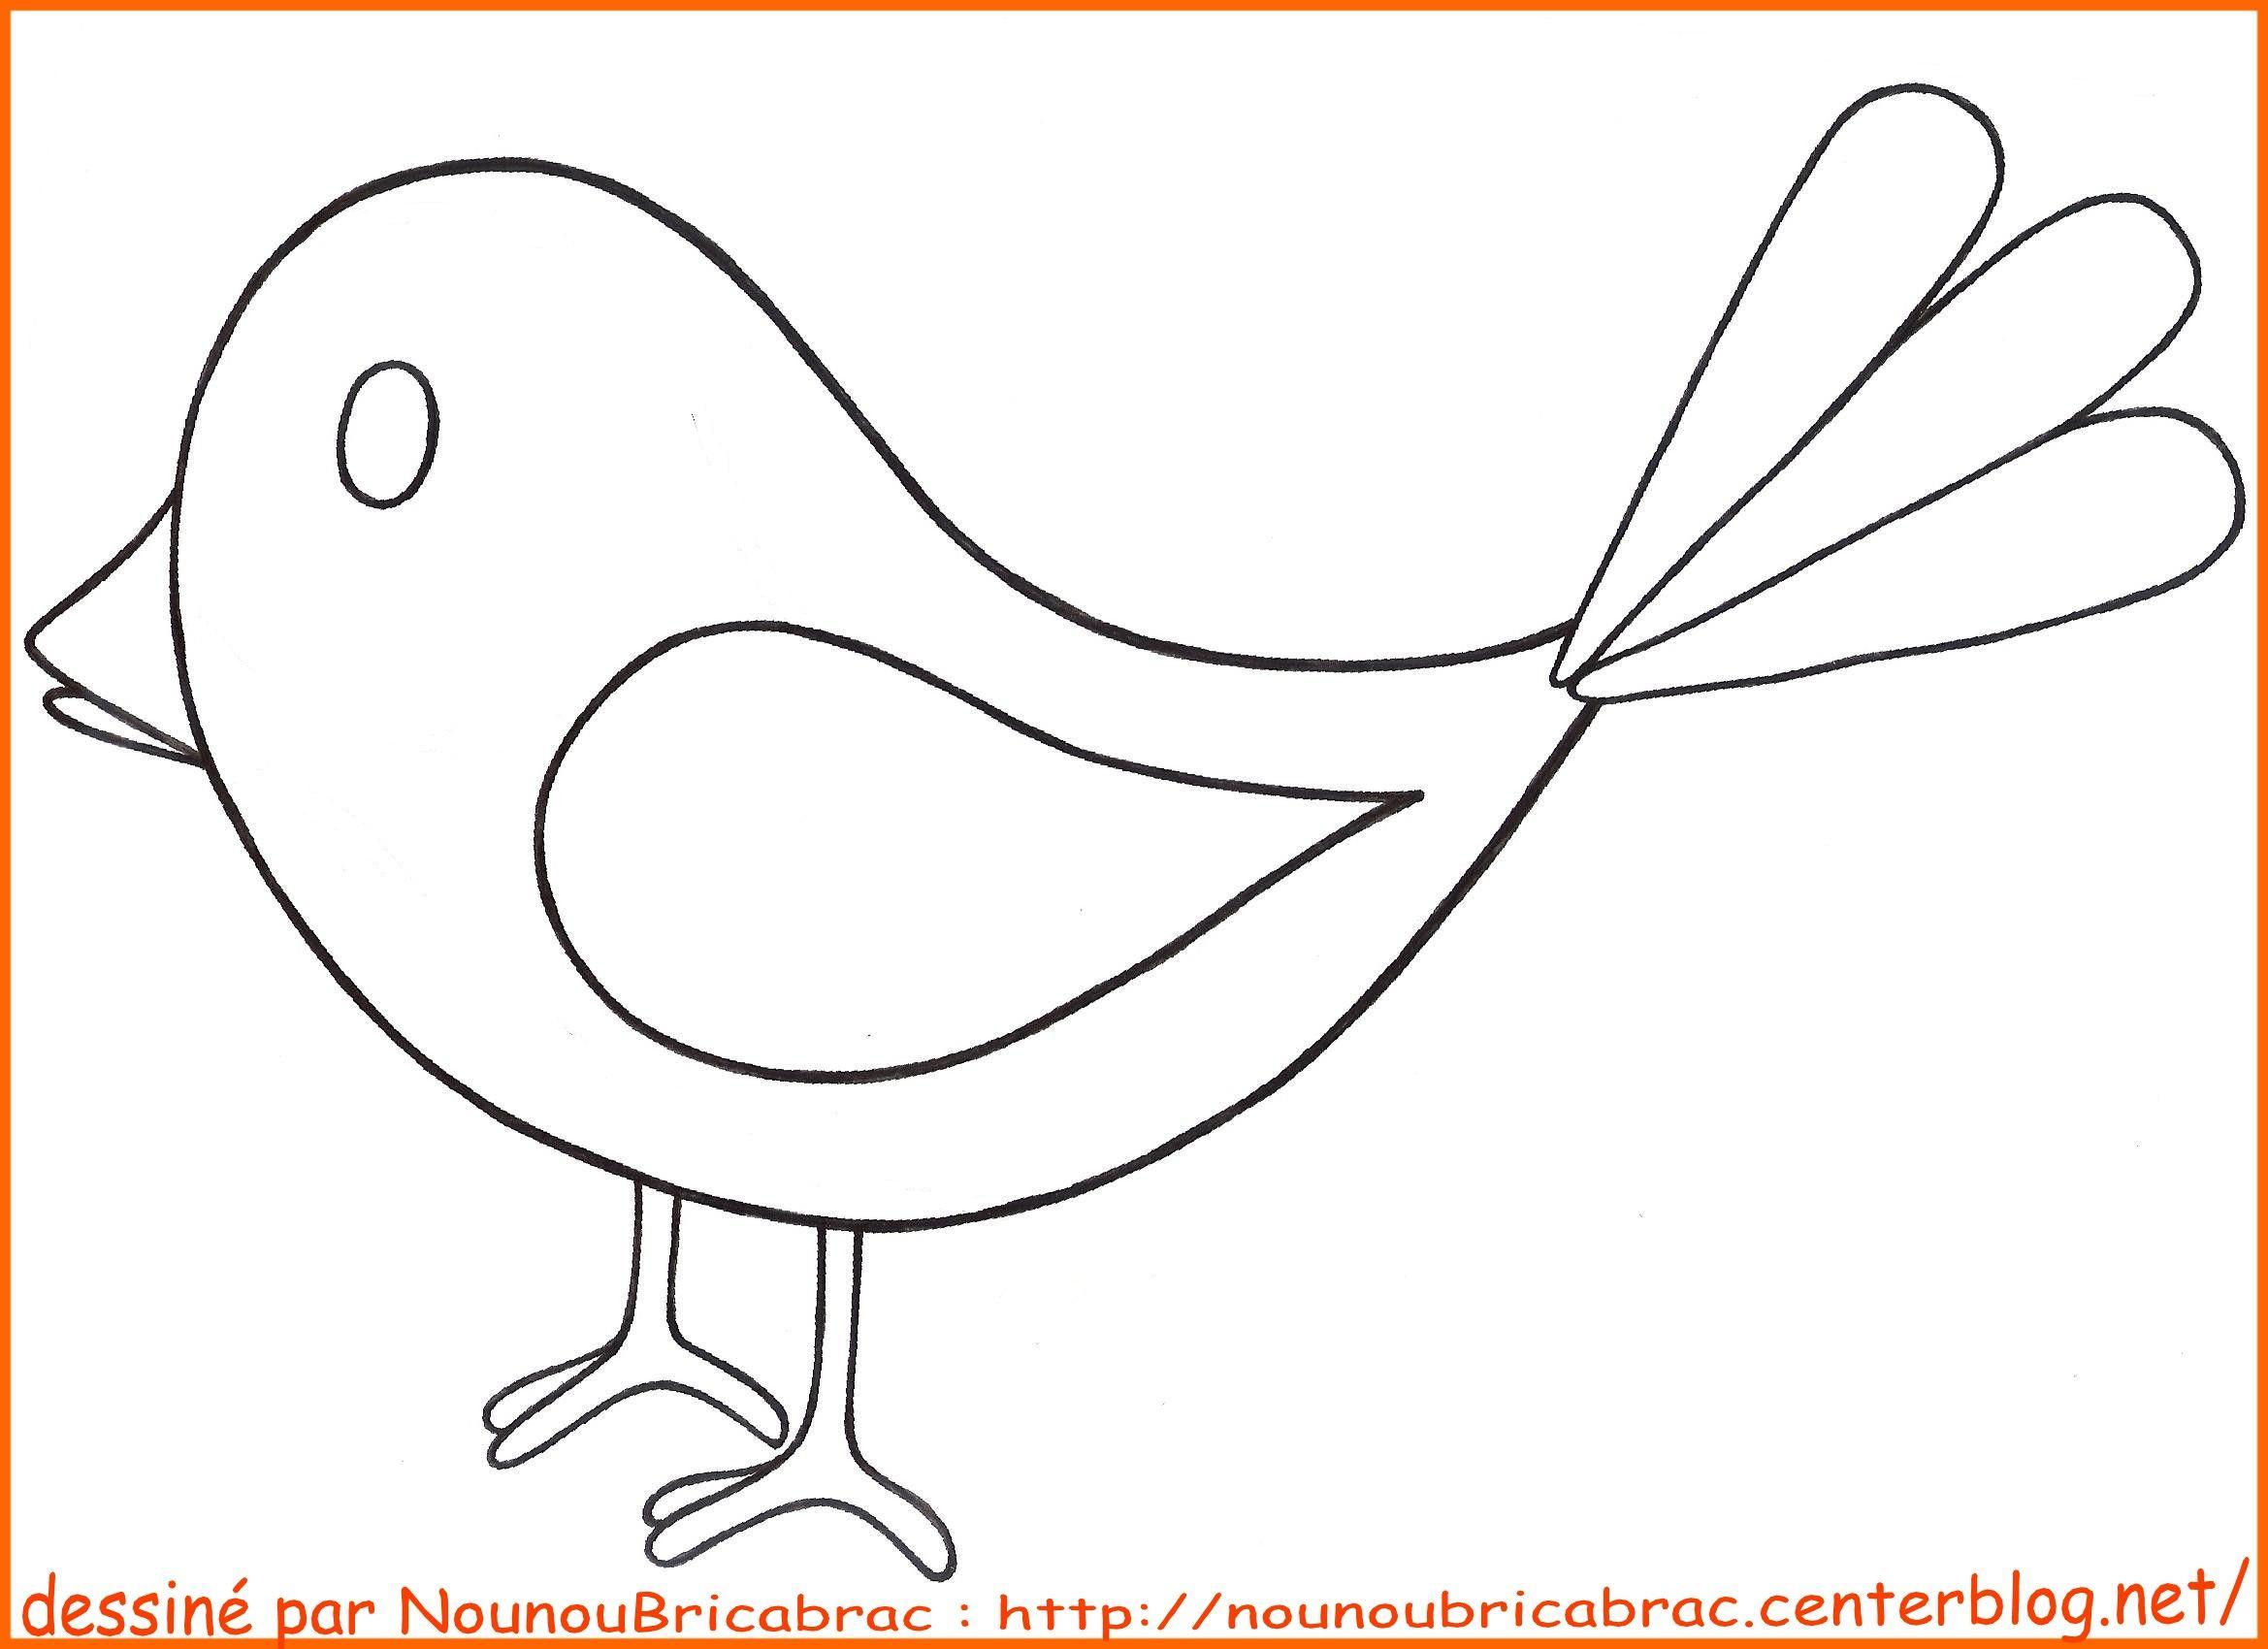 Apprendre a dessiner oiseau - Modele d oiseaux a dessiner ...